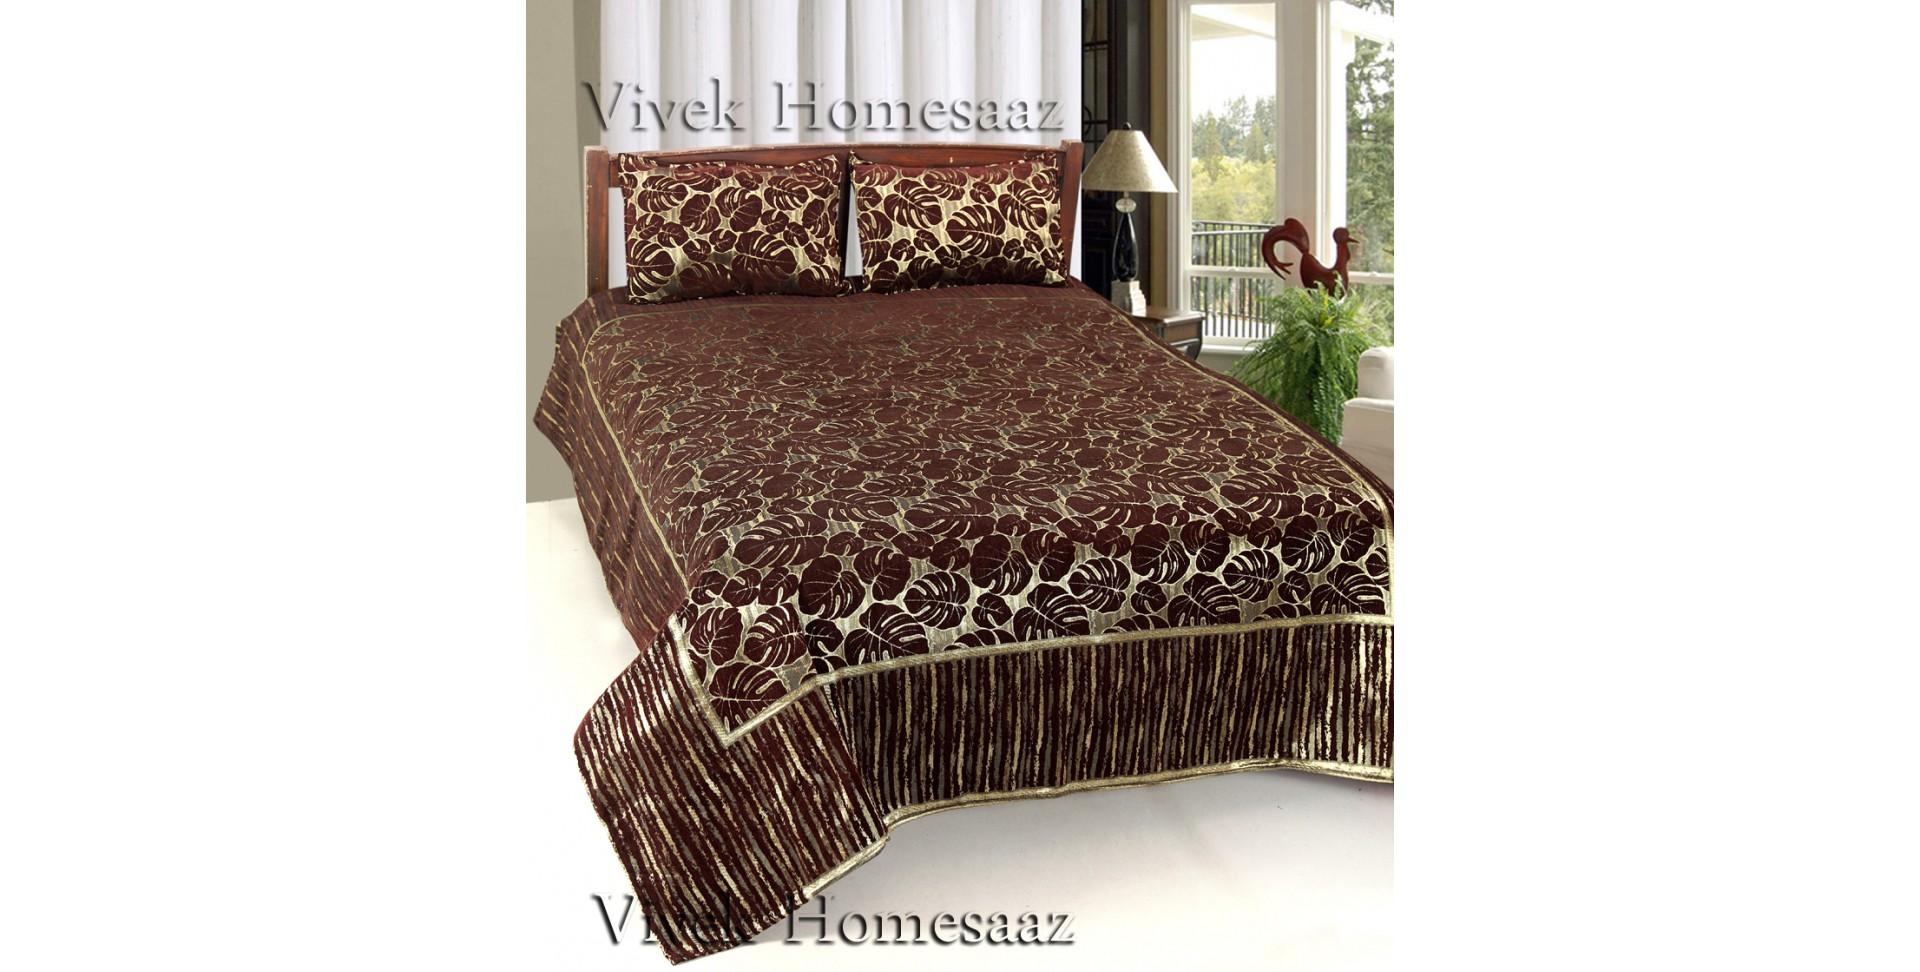 Bed Cover By Vivek Homesaaz Brown Harvest Luxury Quality